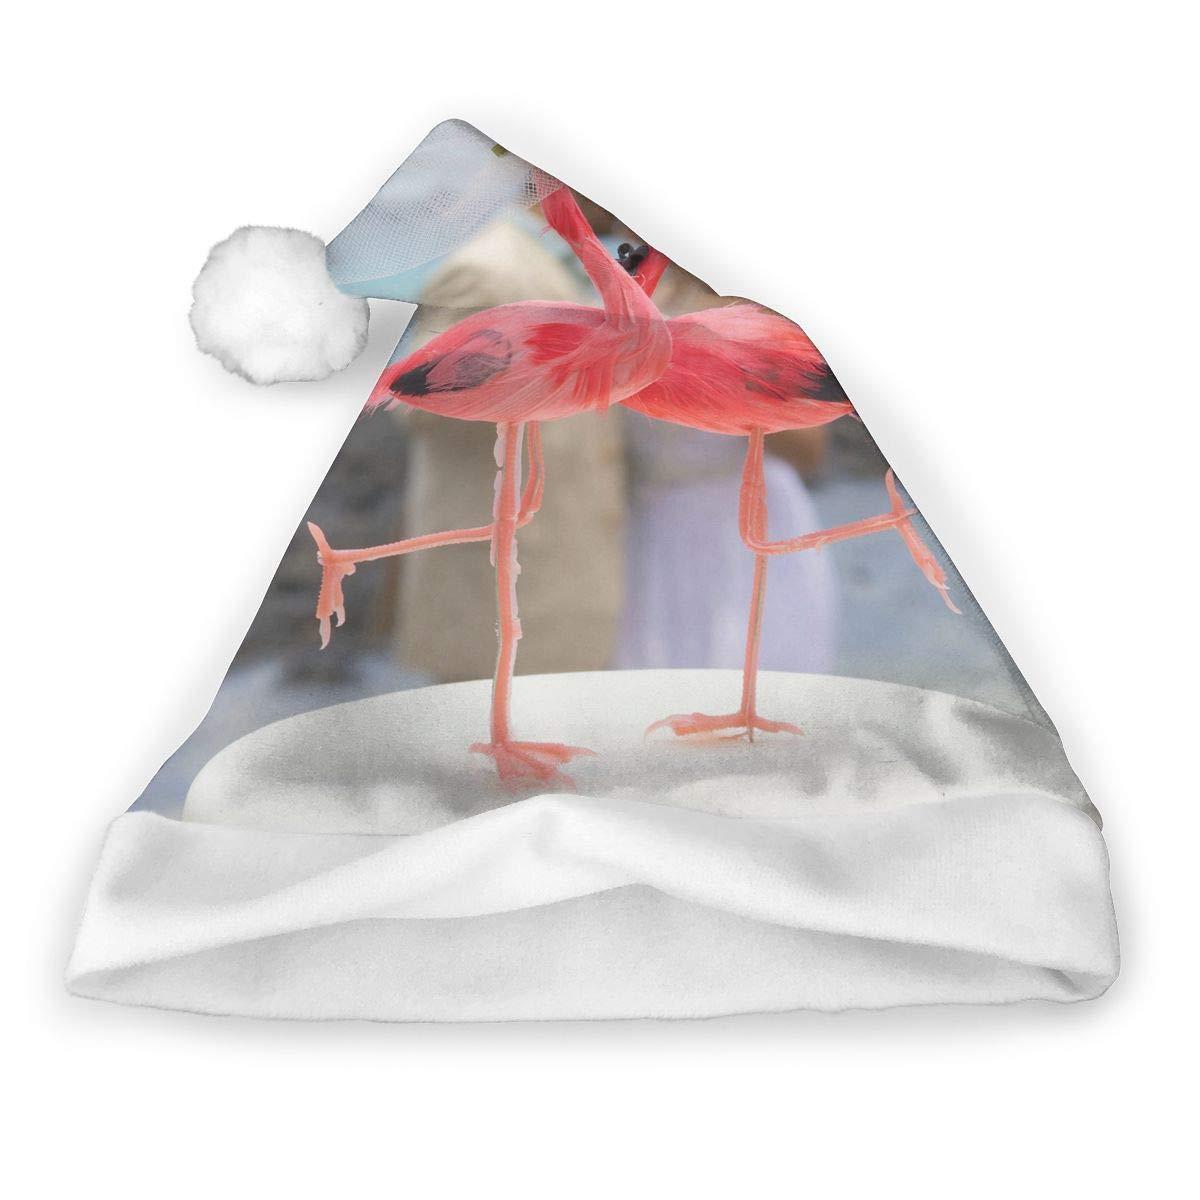 2 PCS Decor Christmas Hat Flamingos Pair Caribbean Birds Santa Headwear Xmas Cap Cosplay Decorations